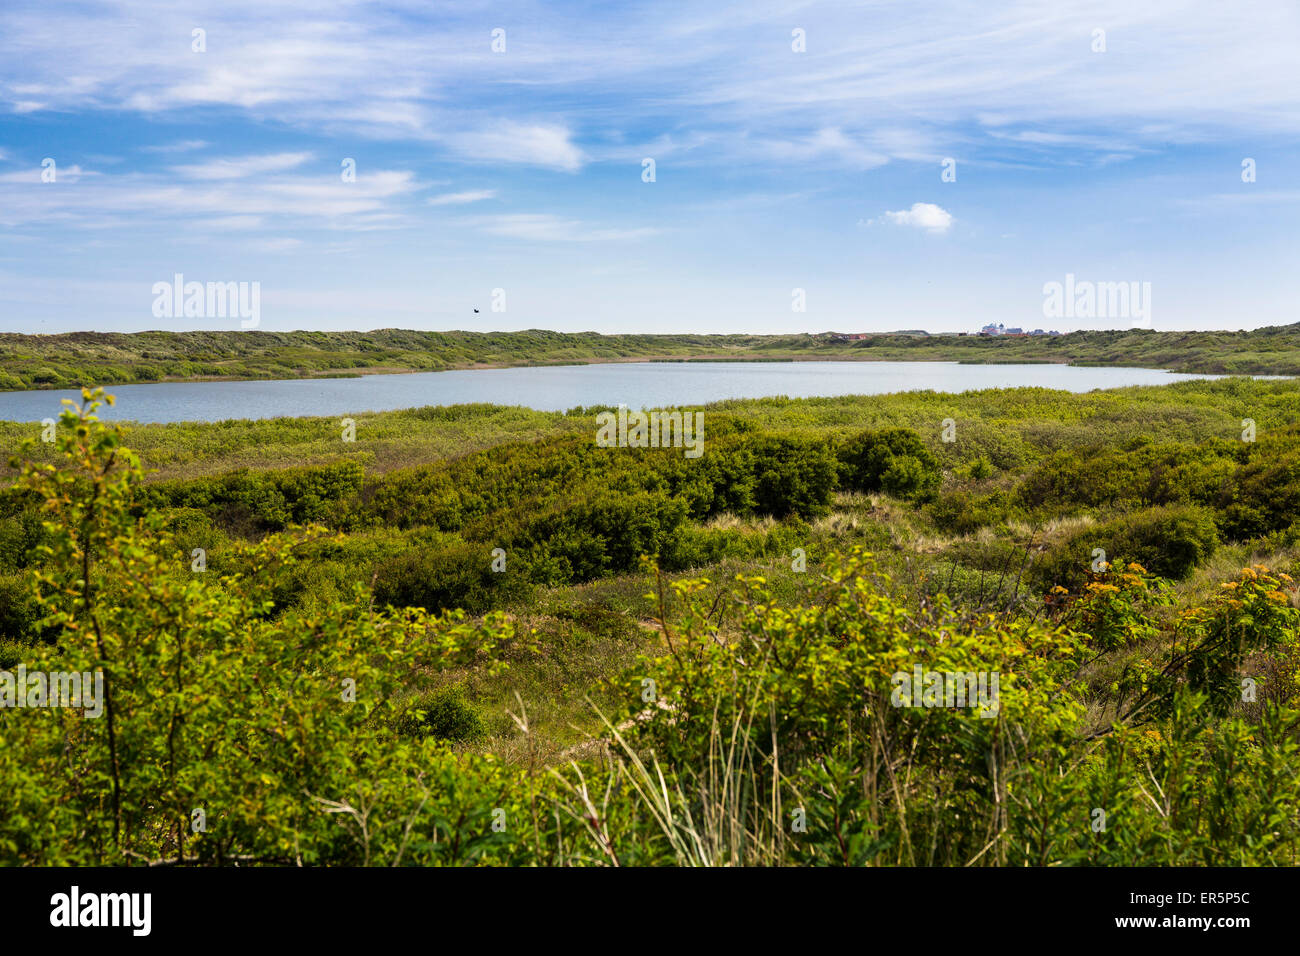 Martillo de lago, isla Juist, Parque Nacional, Mar del Norte, Islas de Frisia Oriental, Frisia Oriental, Baja Sajonia, Imagen De Stock